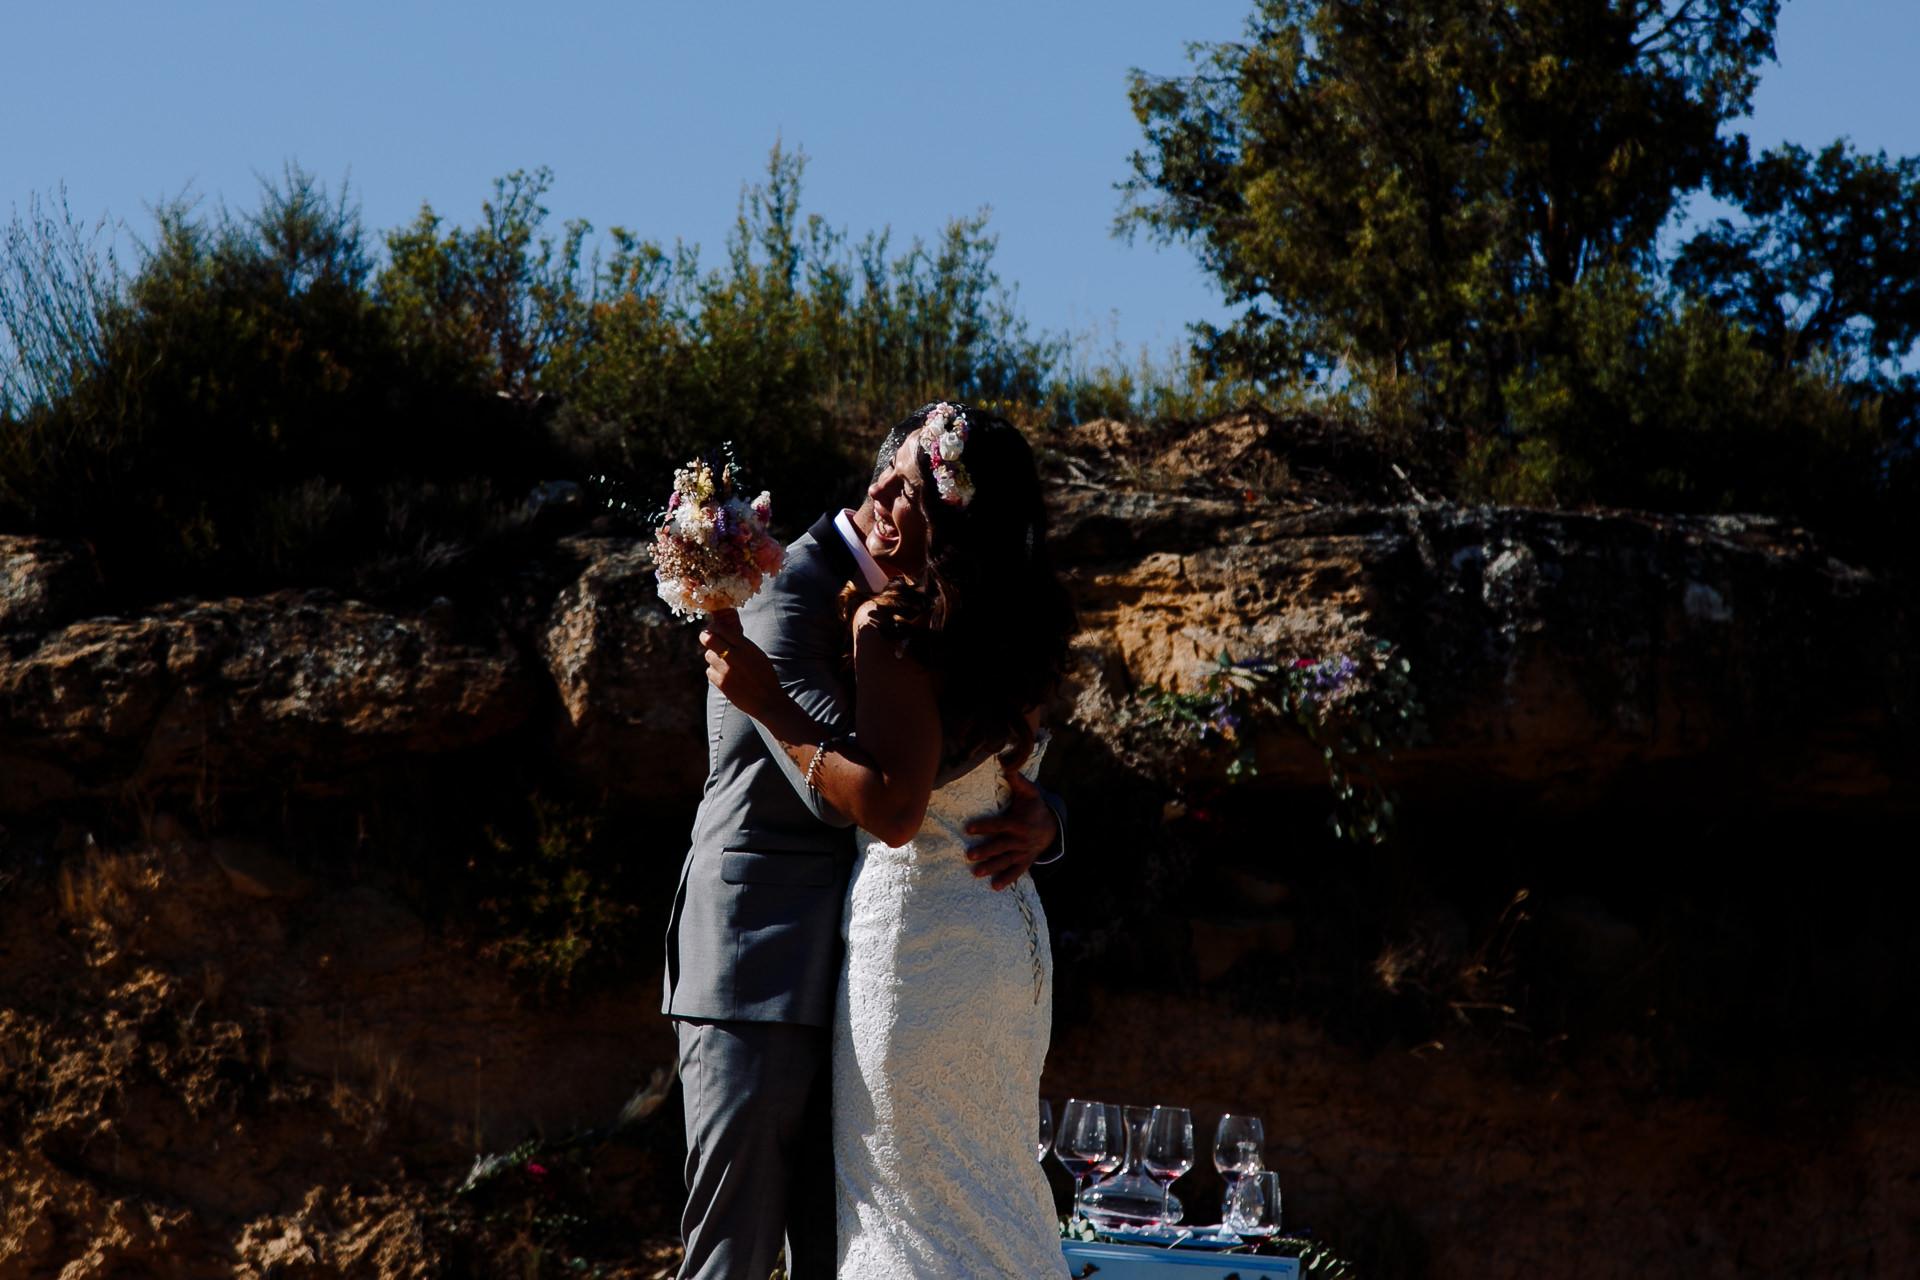 boda civil vinedos larioja lola berantevilla 135037